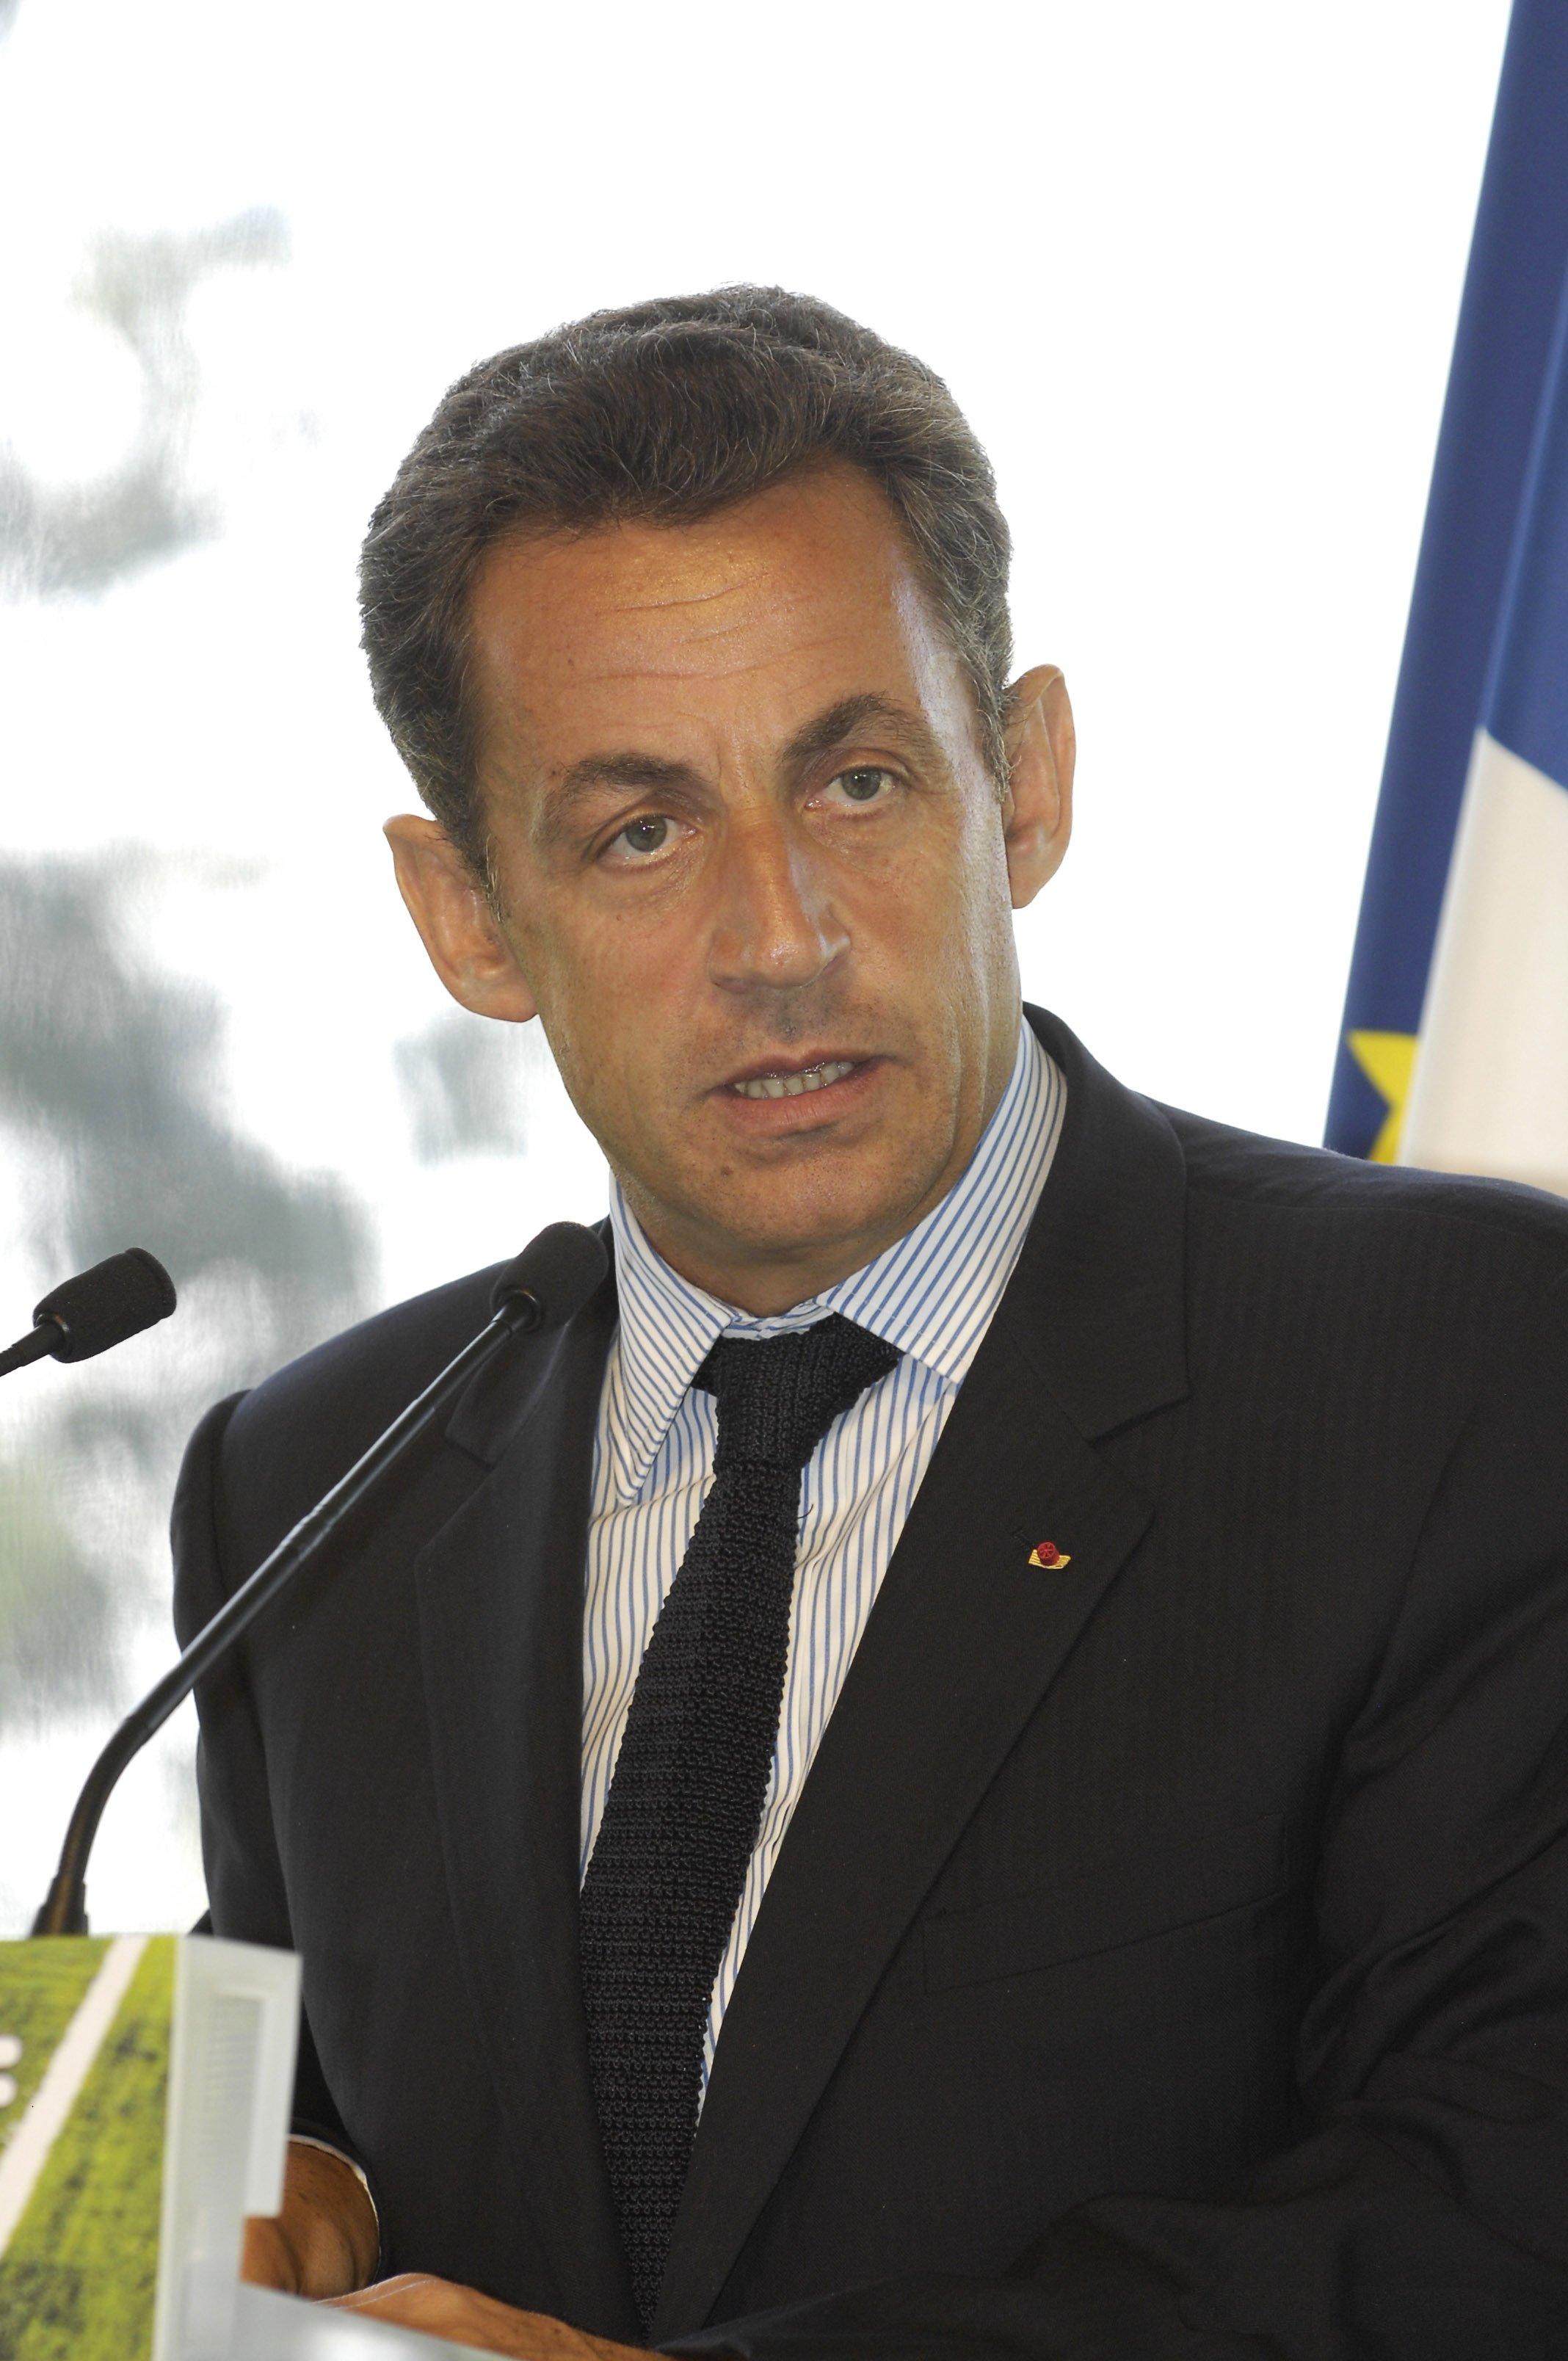 http://fr.academic.ru/pictures/frwiki/78/Nicolas_Sarkozy_MEDEF.jpg